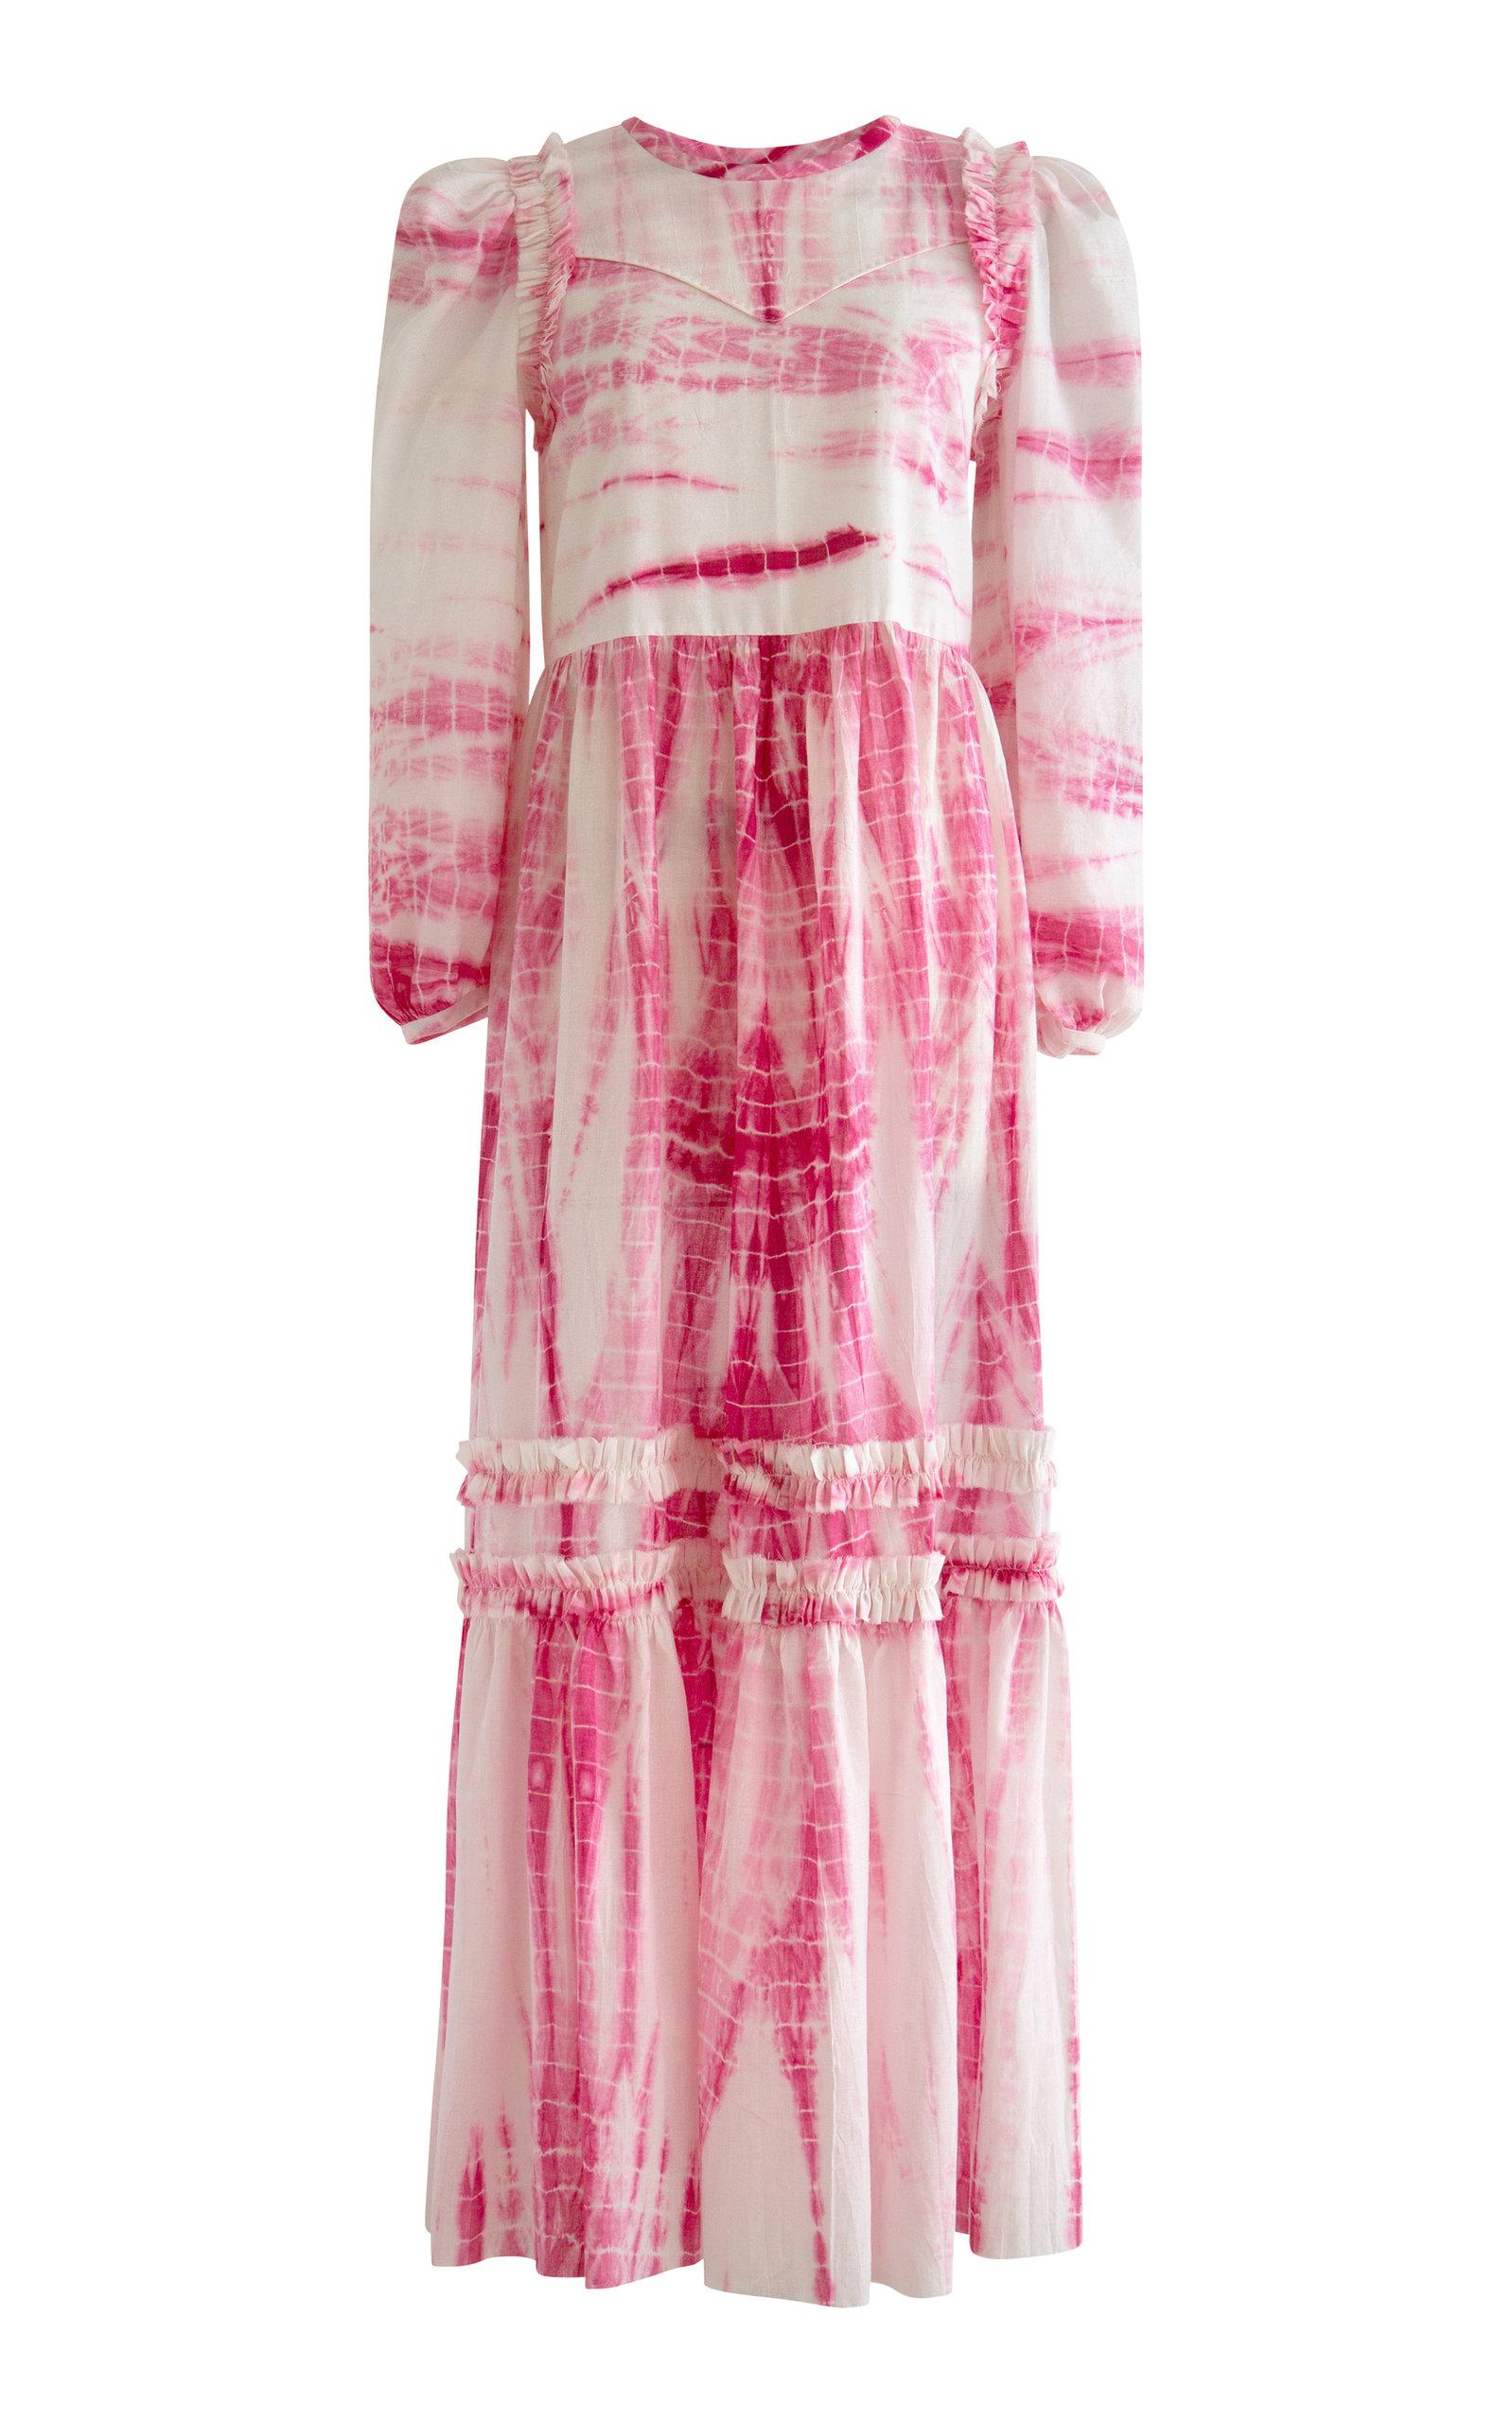 Alix of Bohemia - Women's Plume Shibori Dress - Pink - Moda Operandi